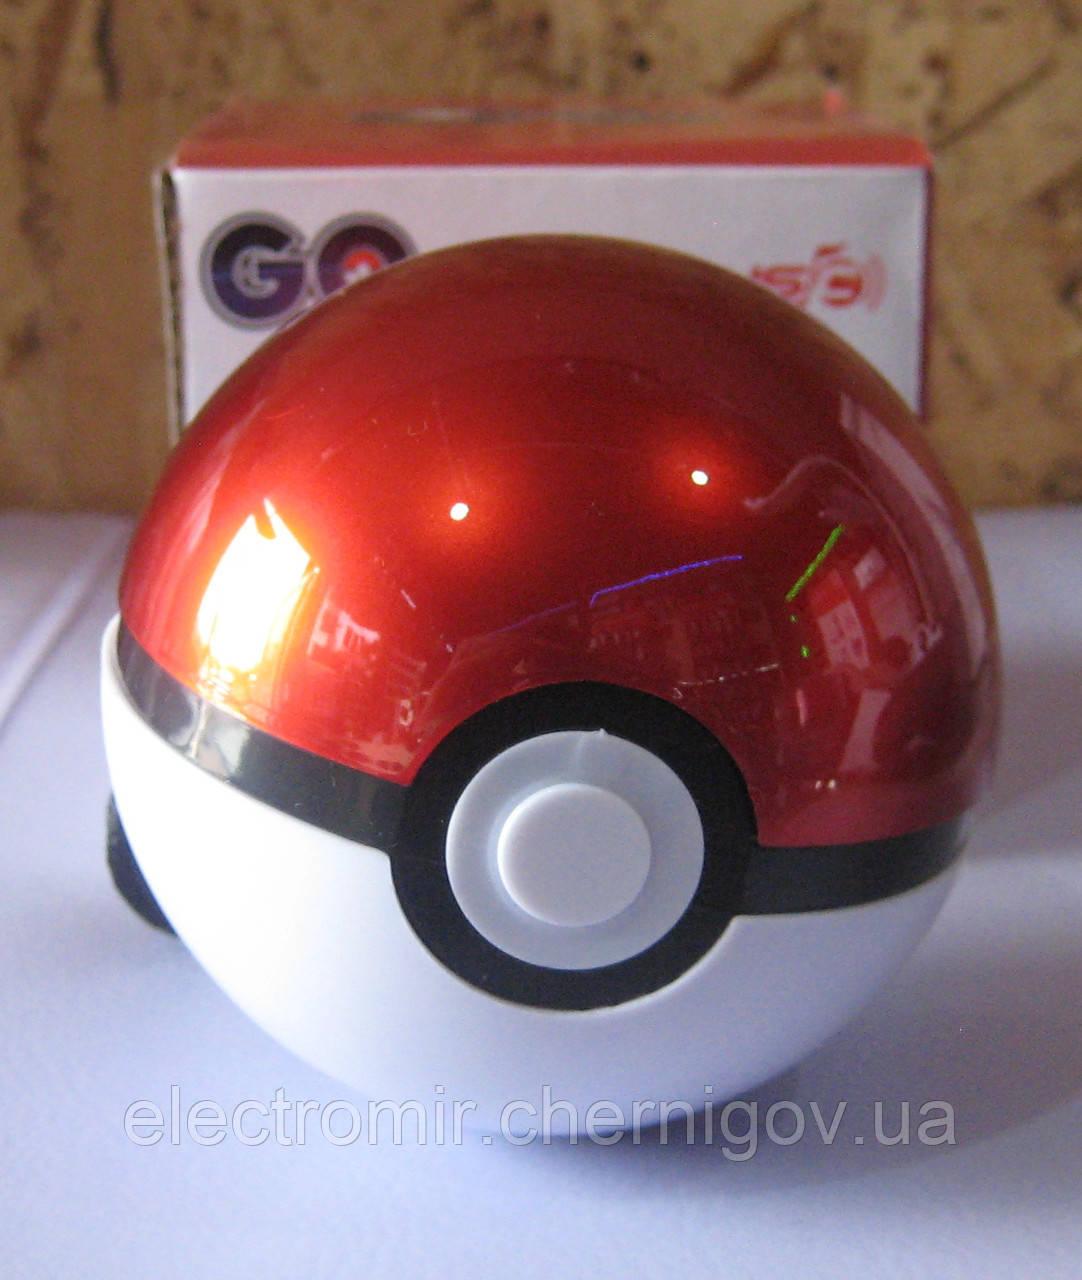 Портативная Bluetooth колонка с USB, SD, FM  и аккумулятором в виде Pokemon GO CH-30A